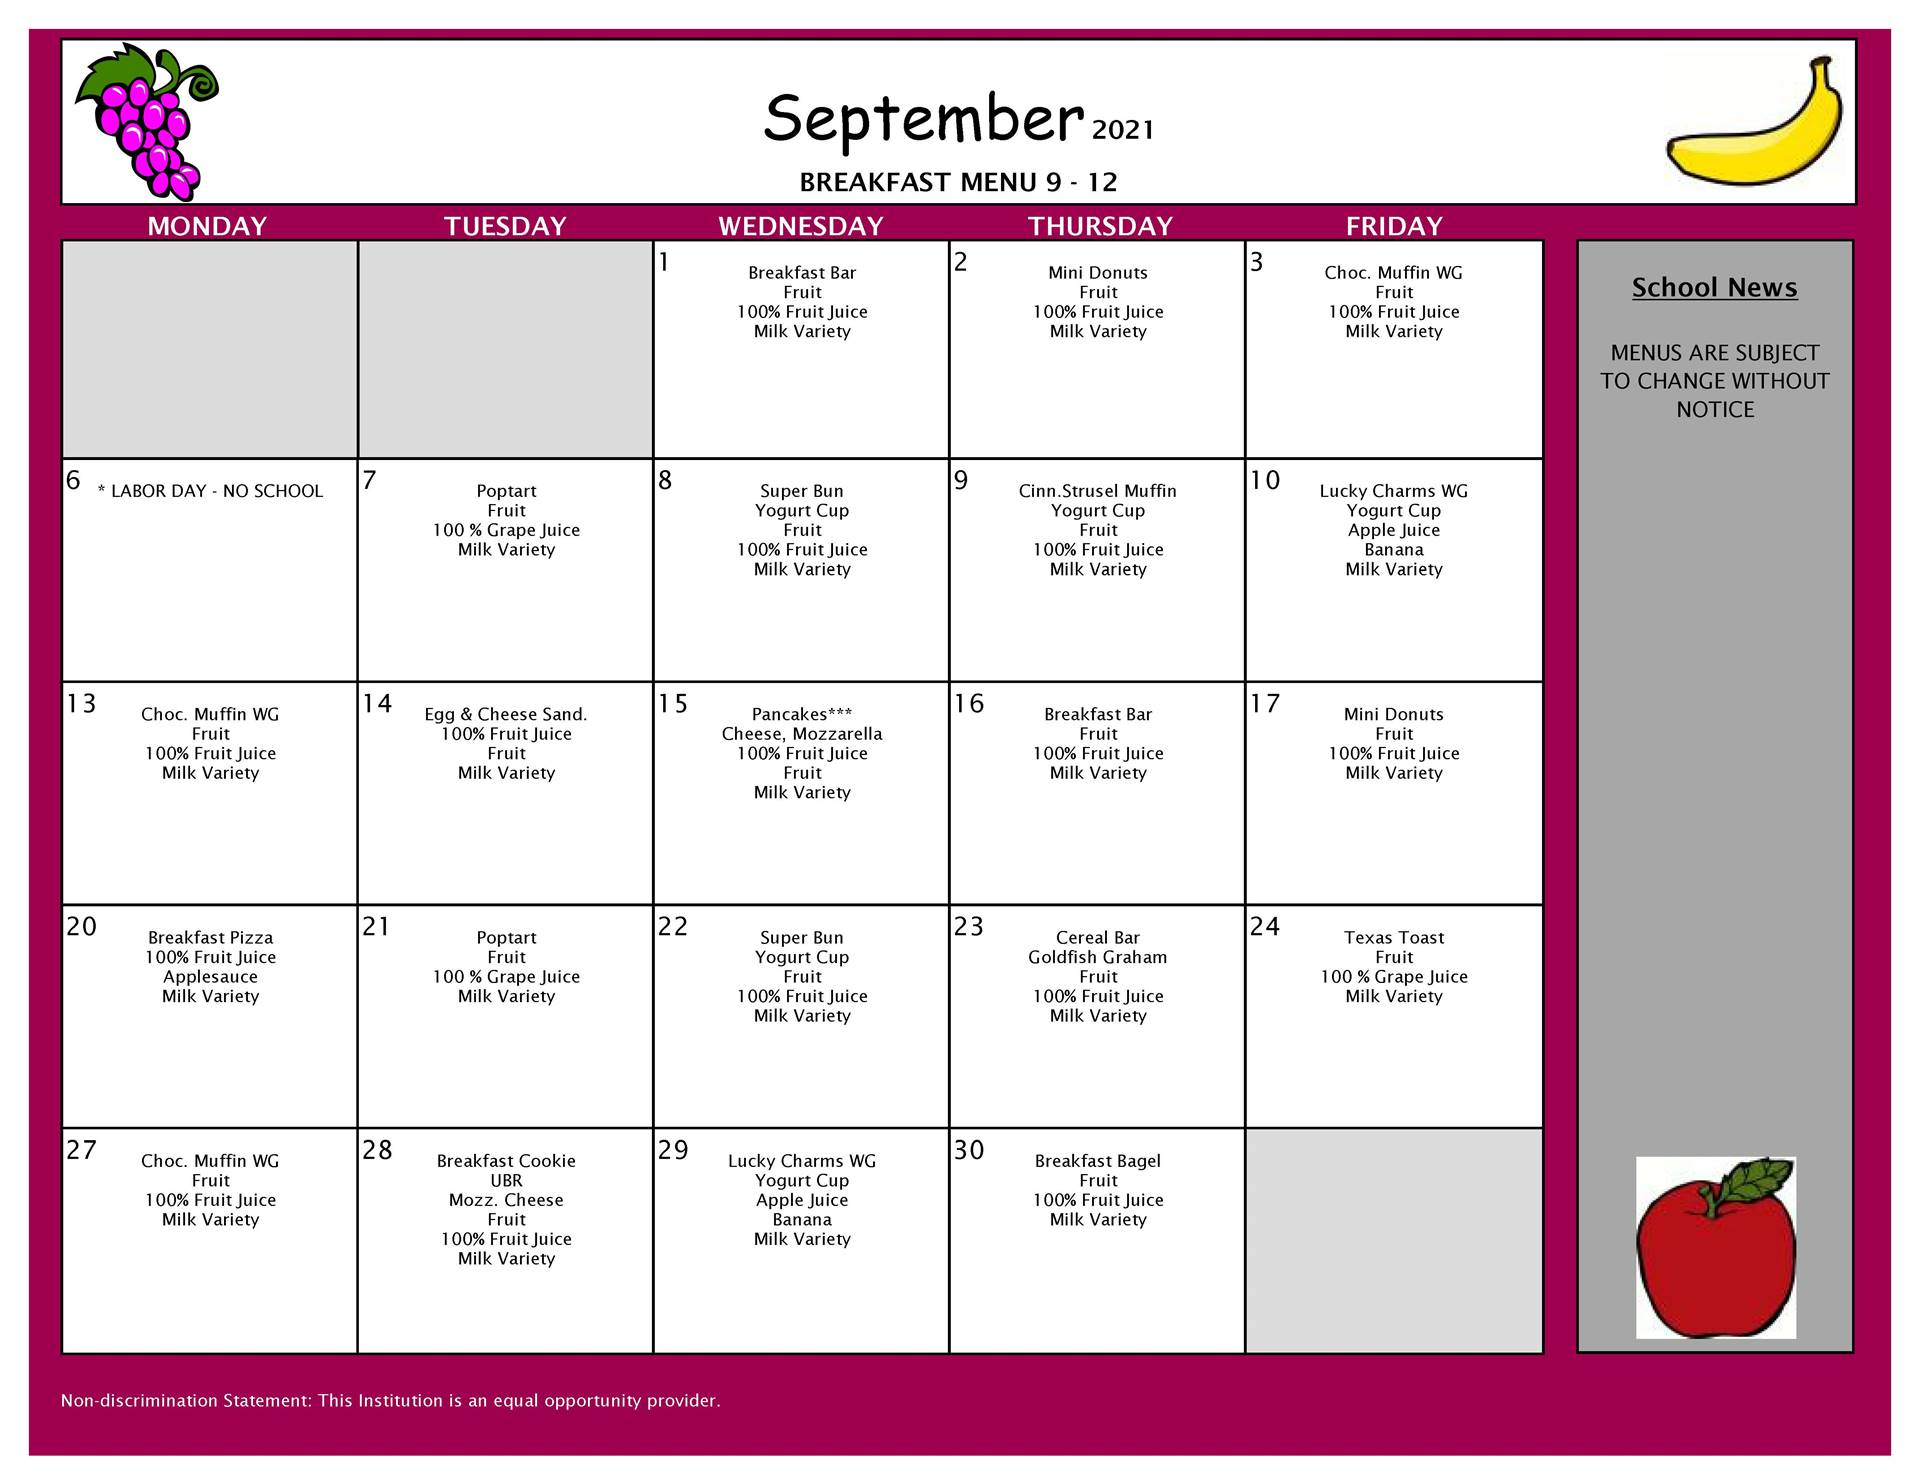 September Breakfast Menu 9-12